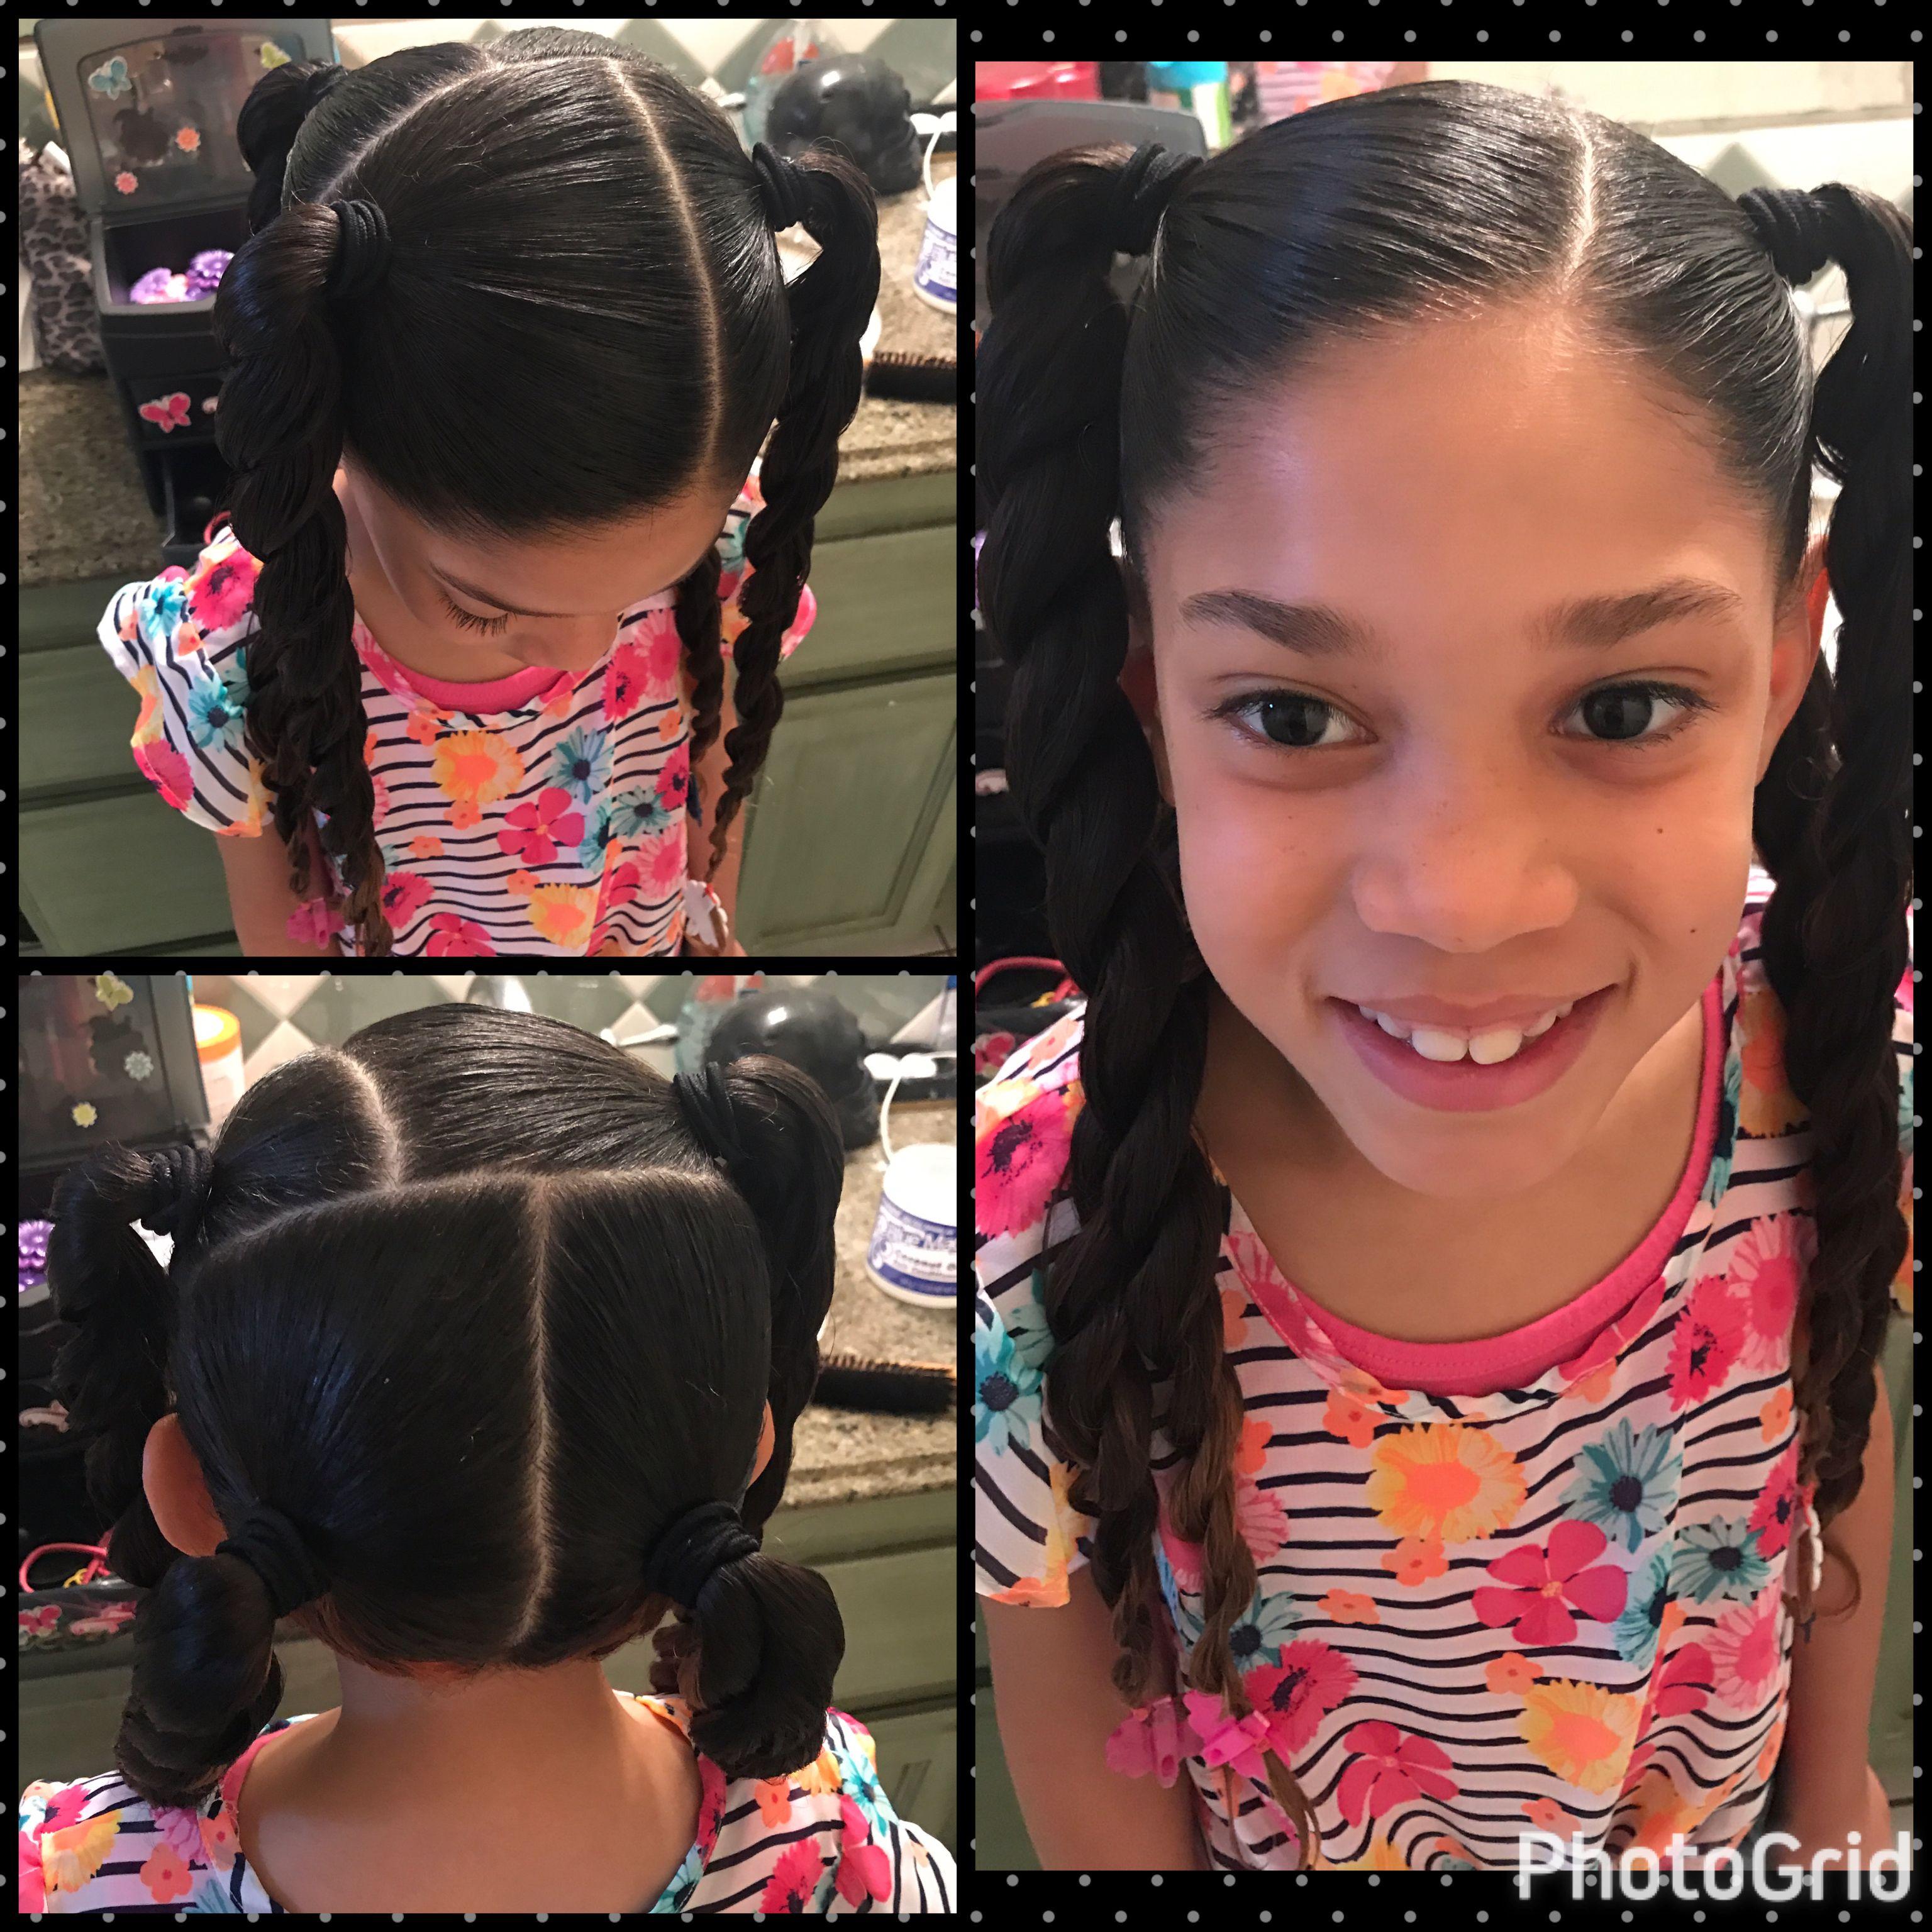 Little Girl Hairstyles Mixed Girls Little Girl Ponytails Little Girl Ponytails Hair Styles Little Girl Hairstyles